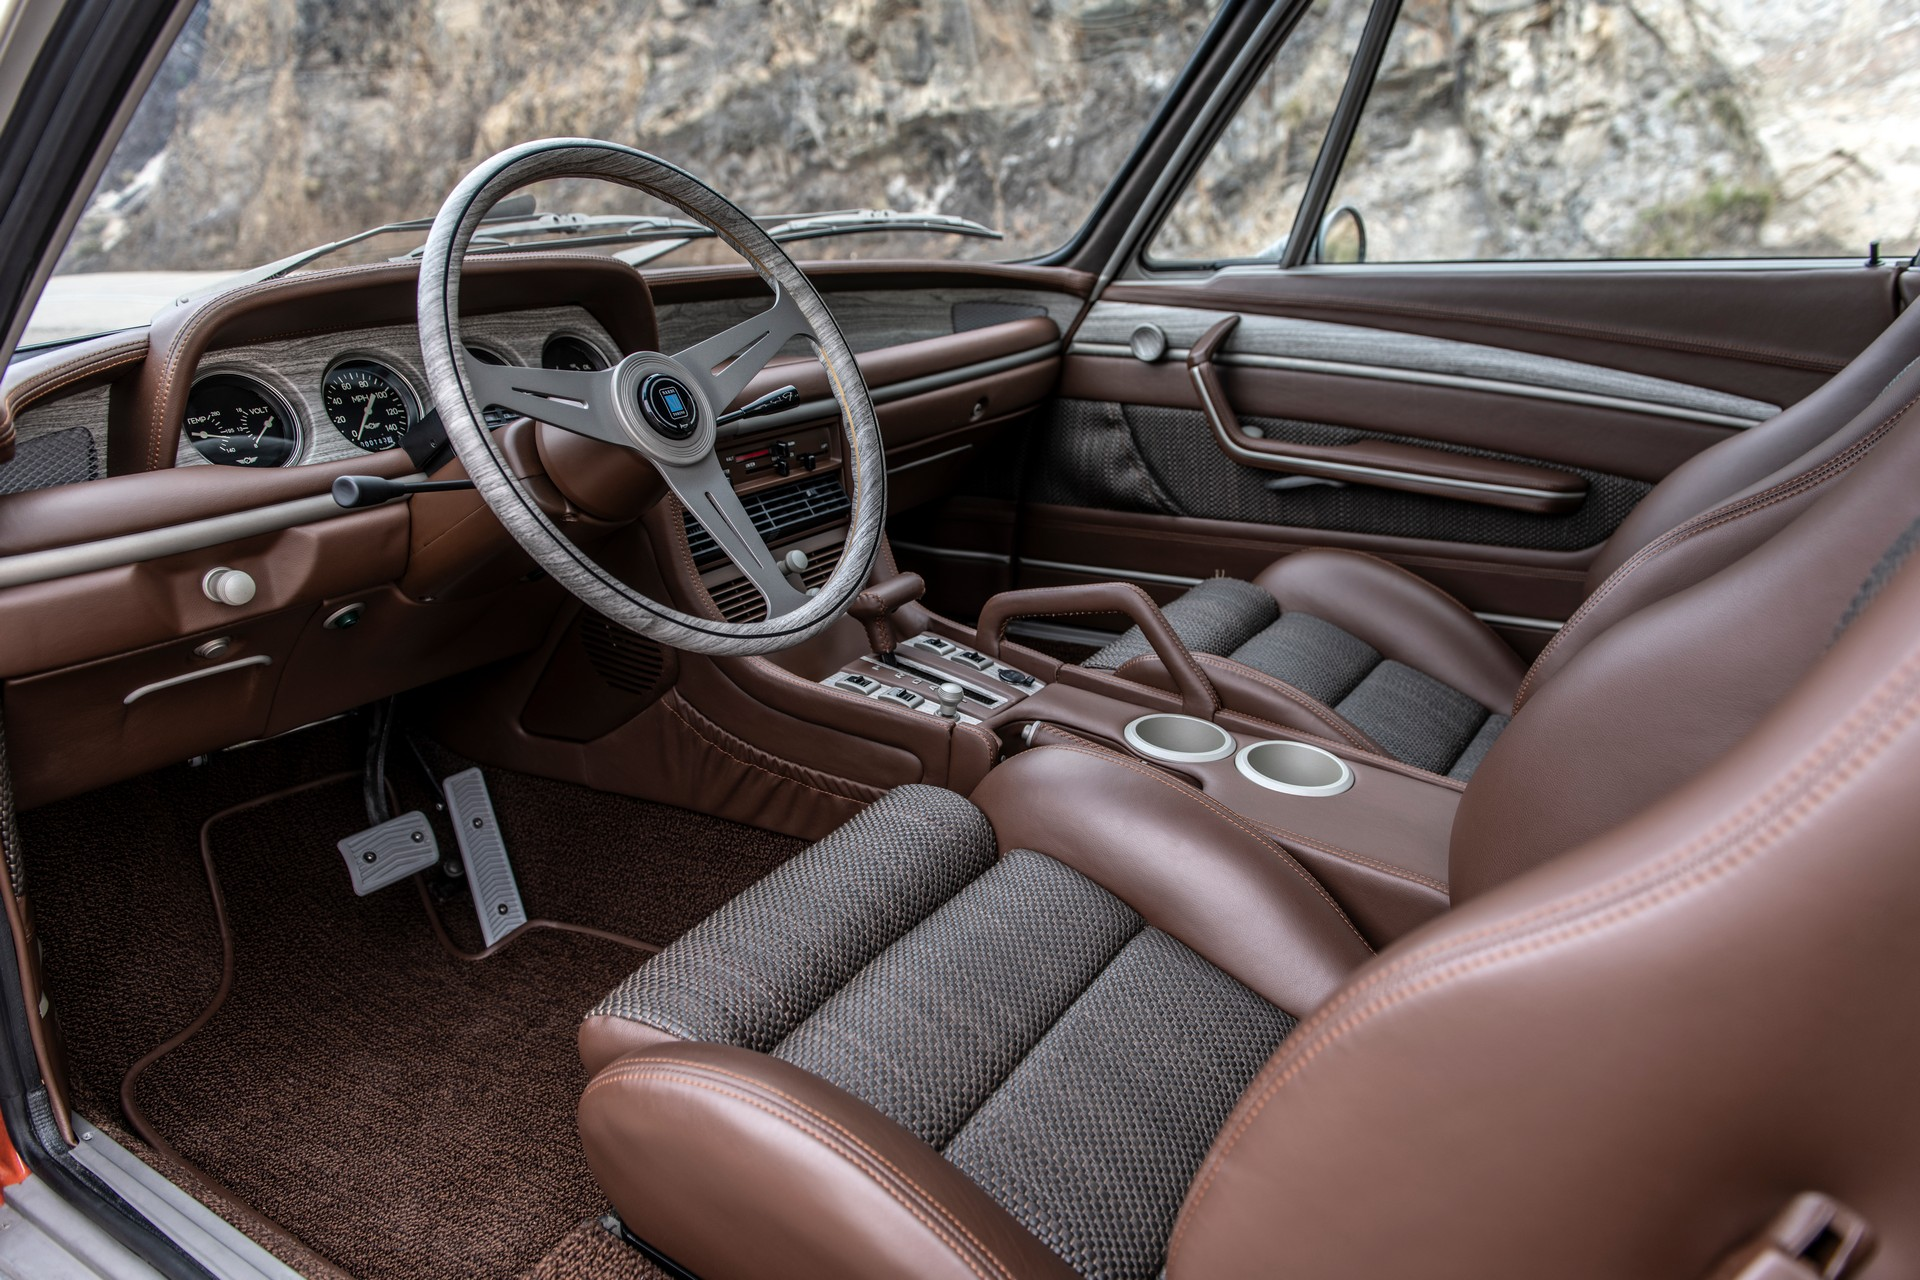 1974 SpeedKore BMW 3.0 CS Interior